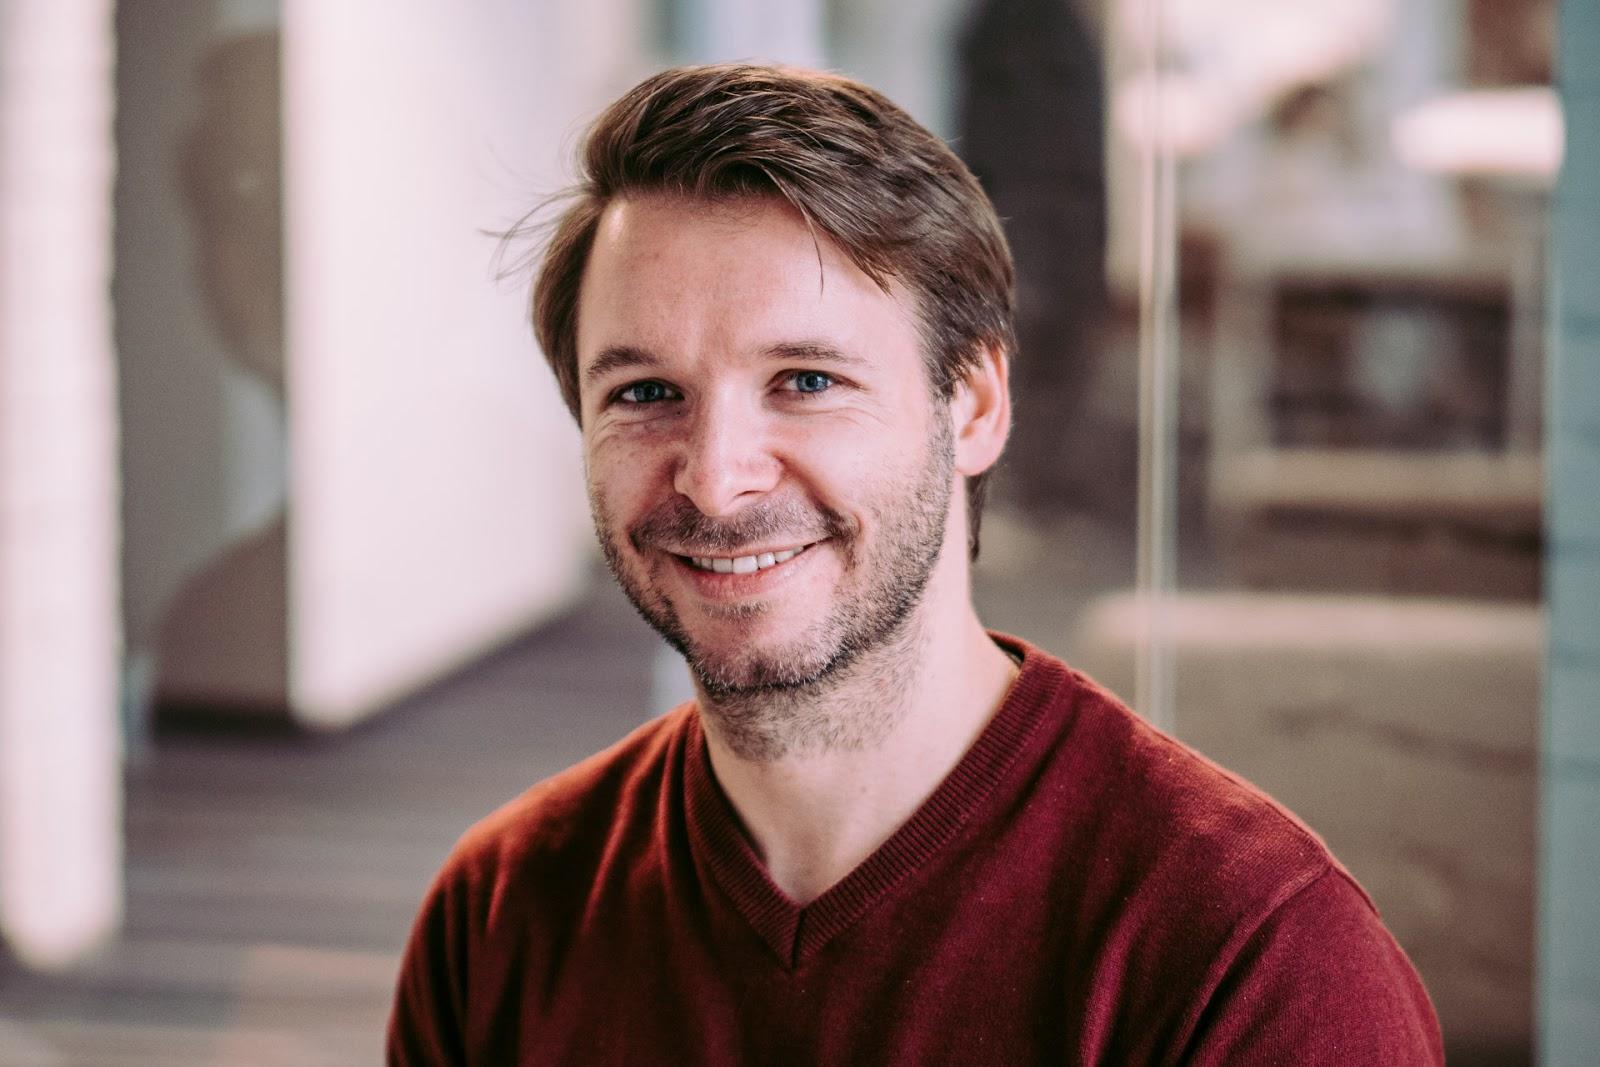 Dawid Pawlicki, Head of Marketing at Divante, photo: KB